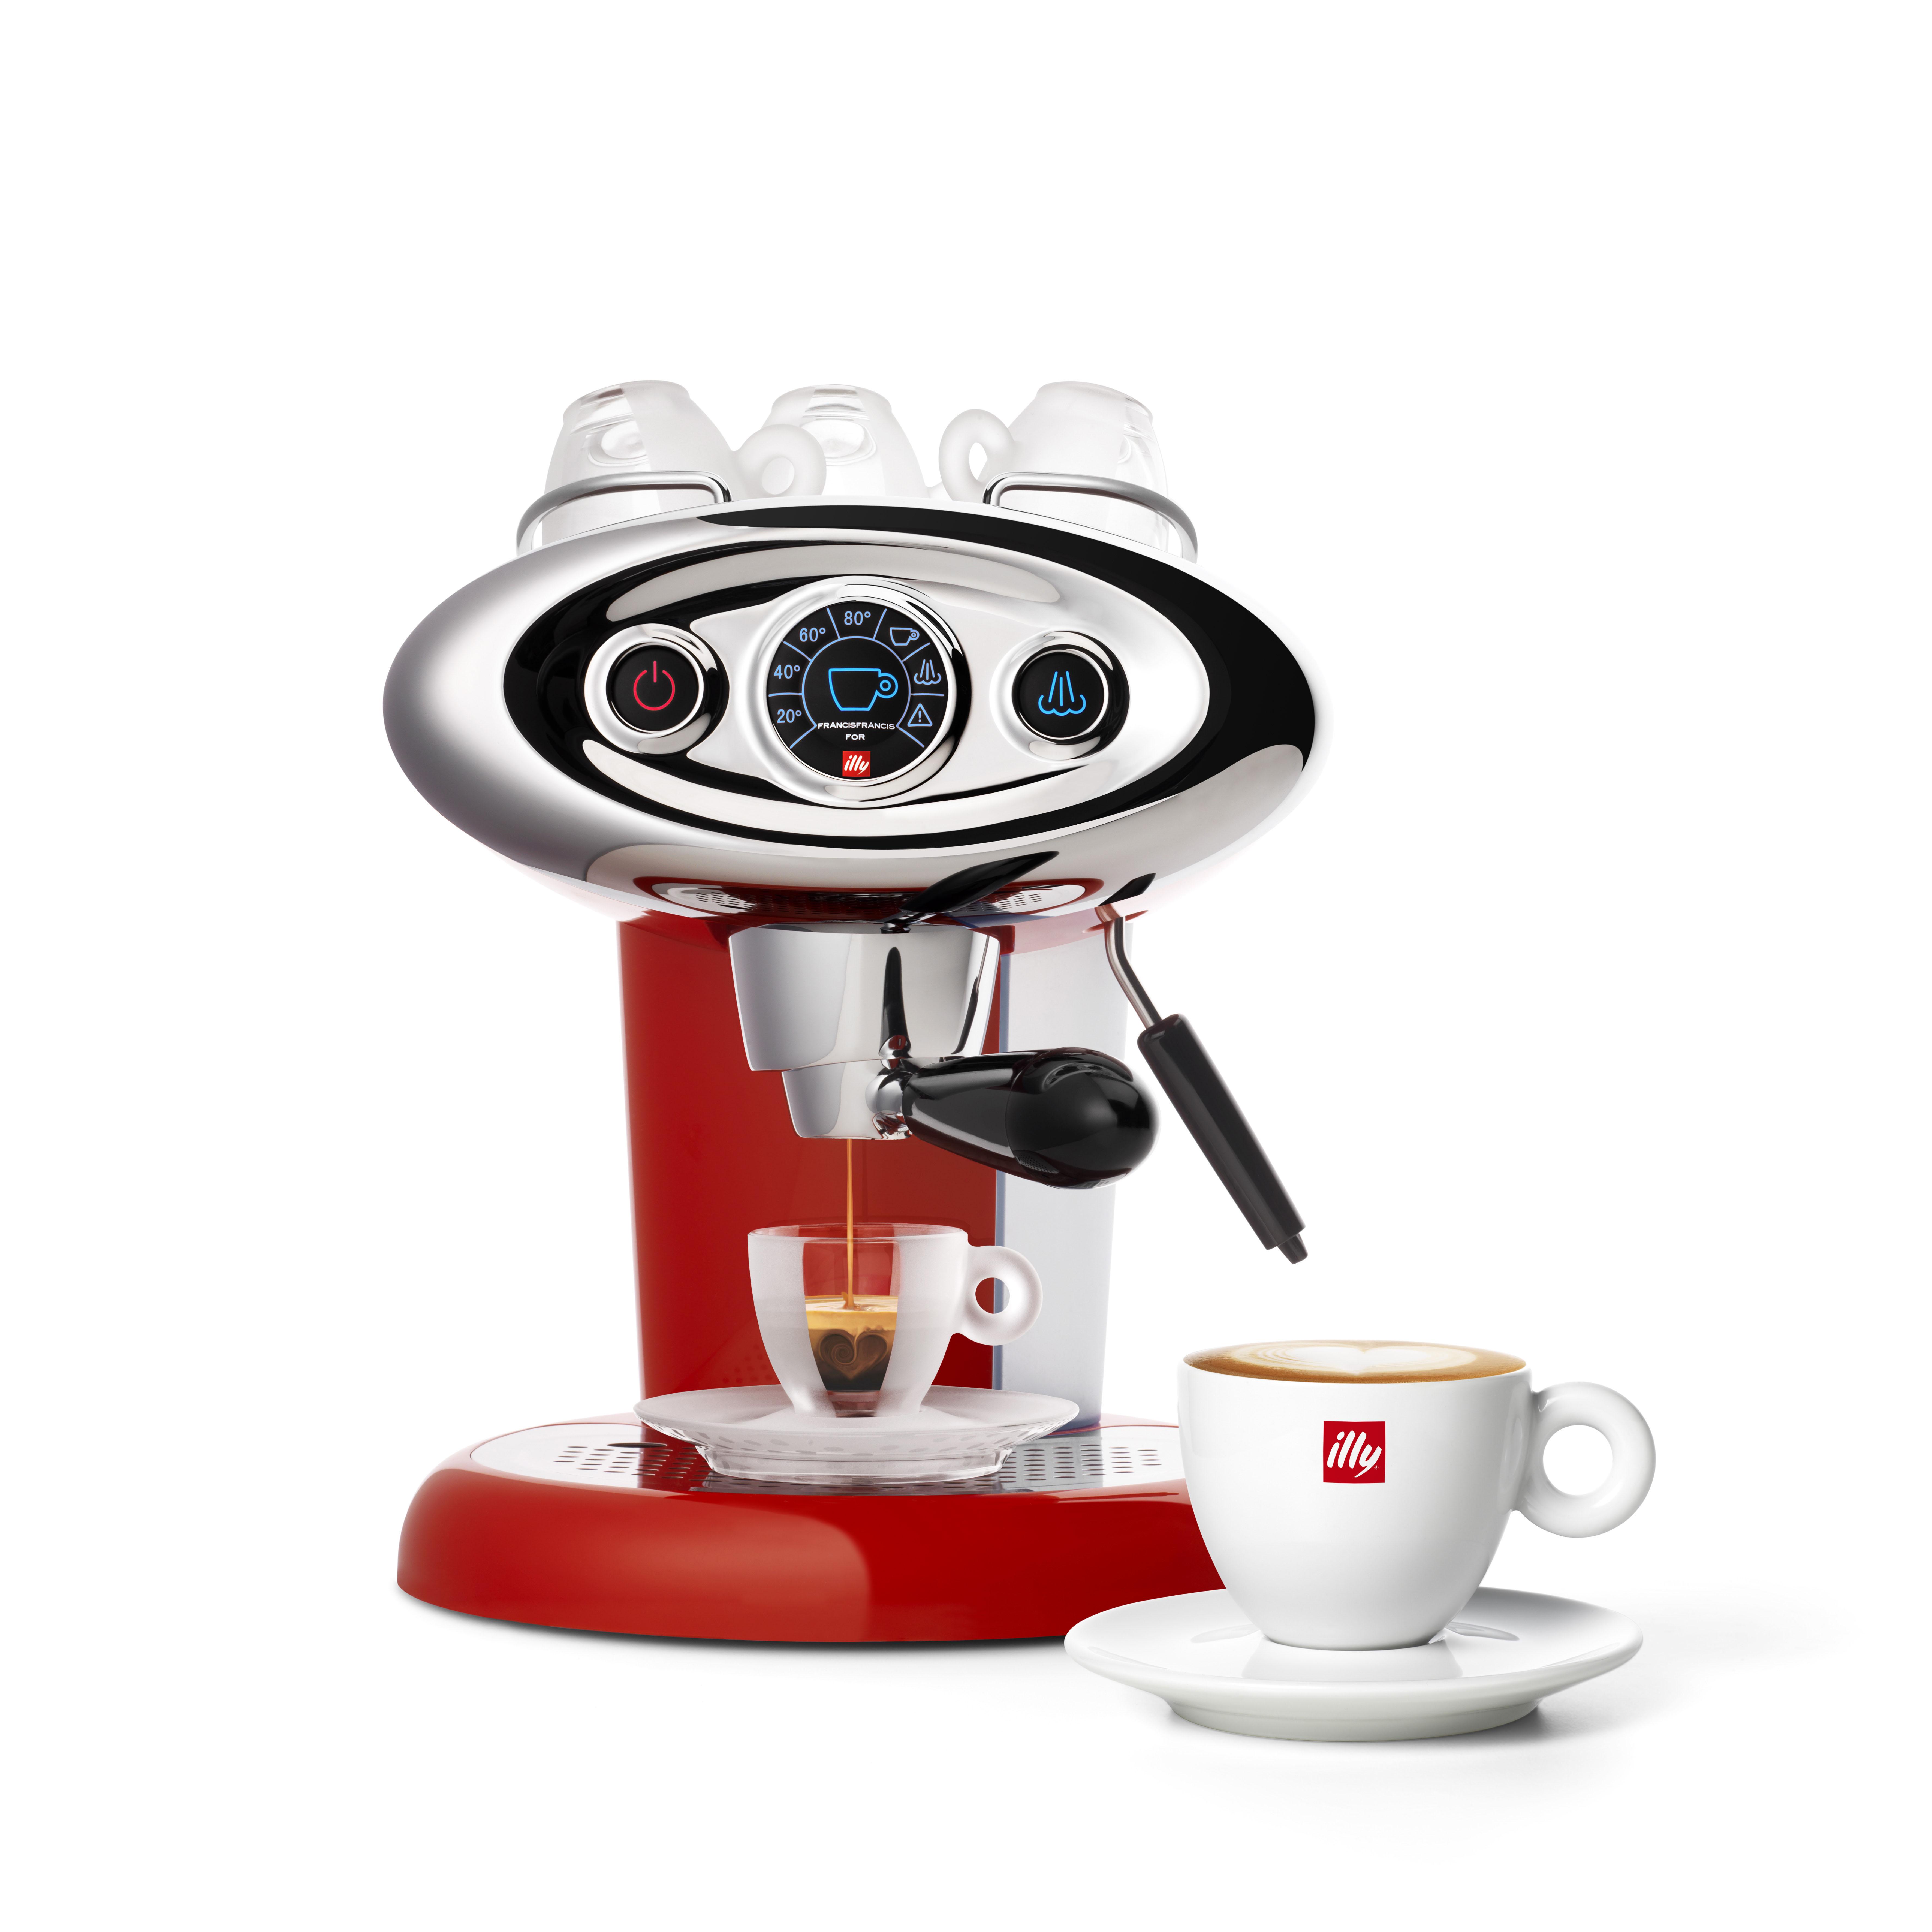 illy francis francis x7 1 iperespresso machine espresso maker 120 volt ebay. Black Bedroom Furniture Sets. Home Design Ideas